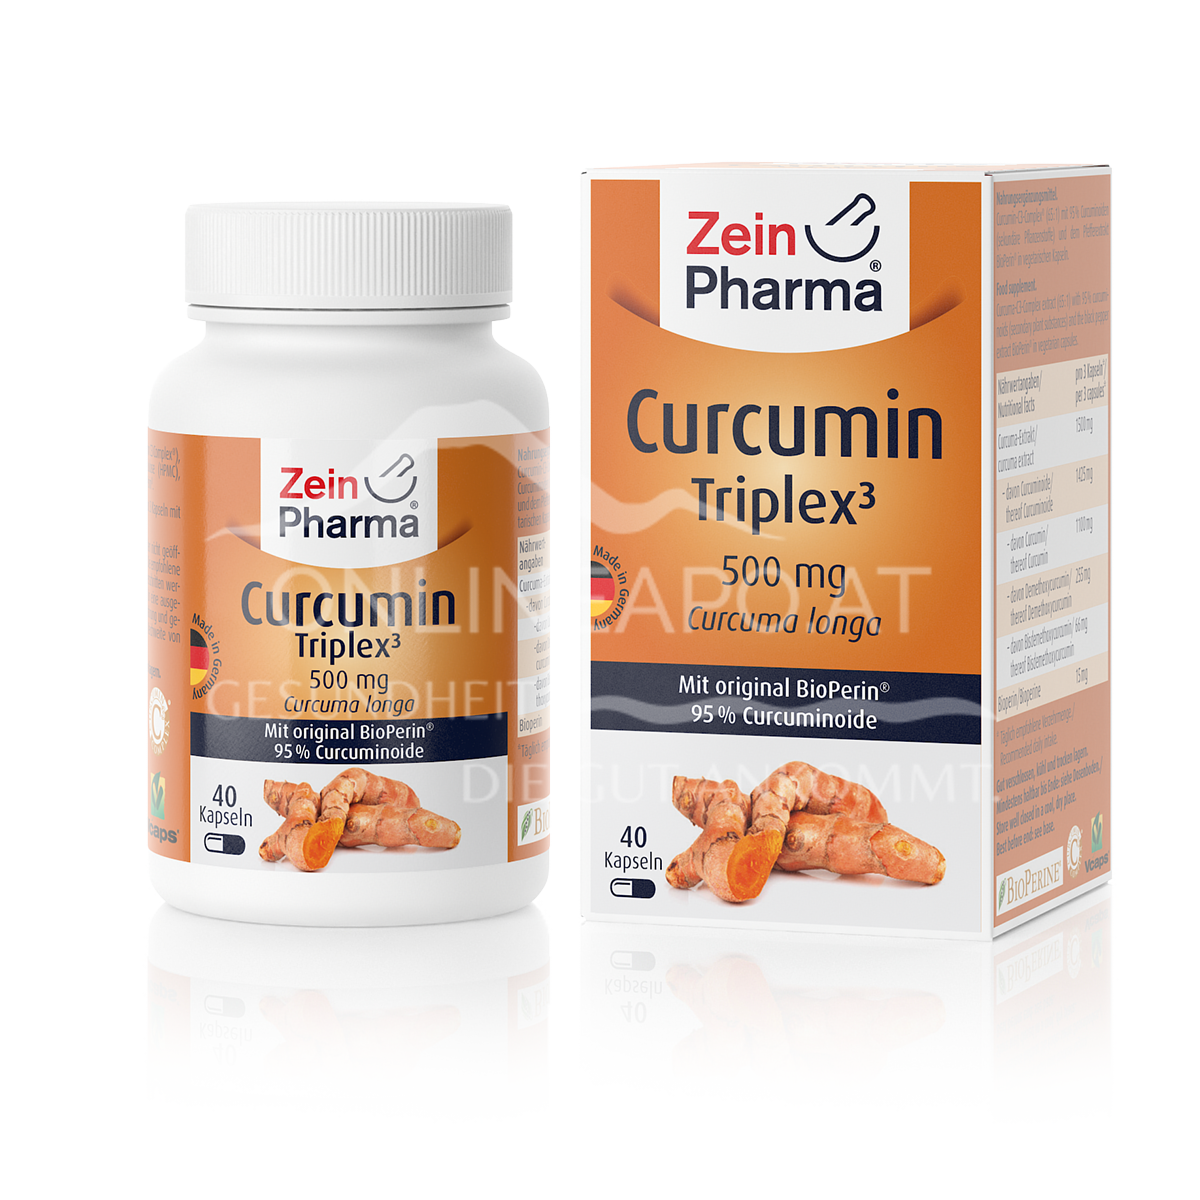 Zeinpharma Curcumin 500 mg